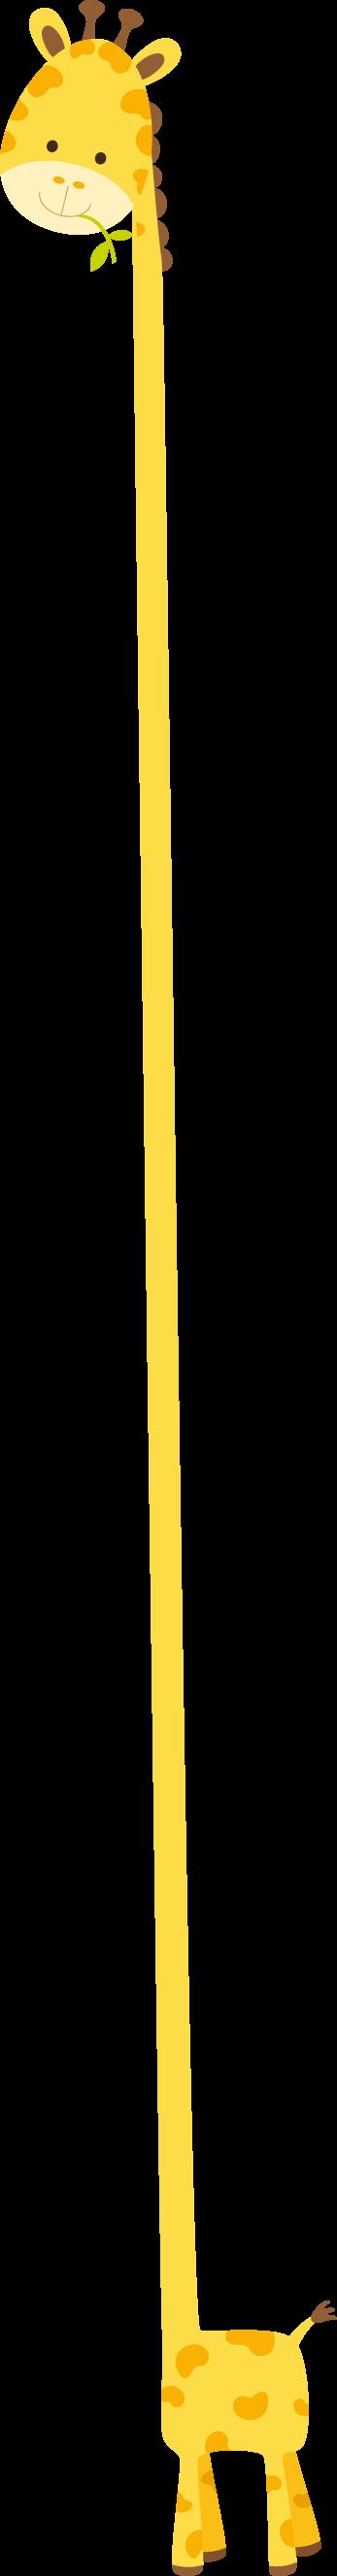 Kids in Motion - Miba - Anmeldung - Giraffe